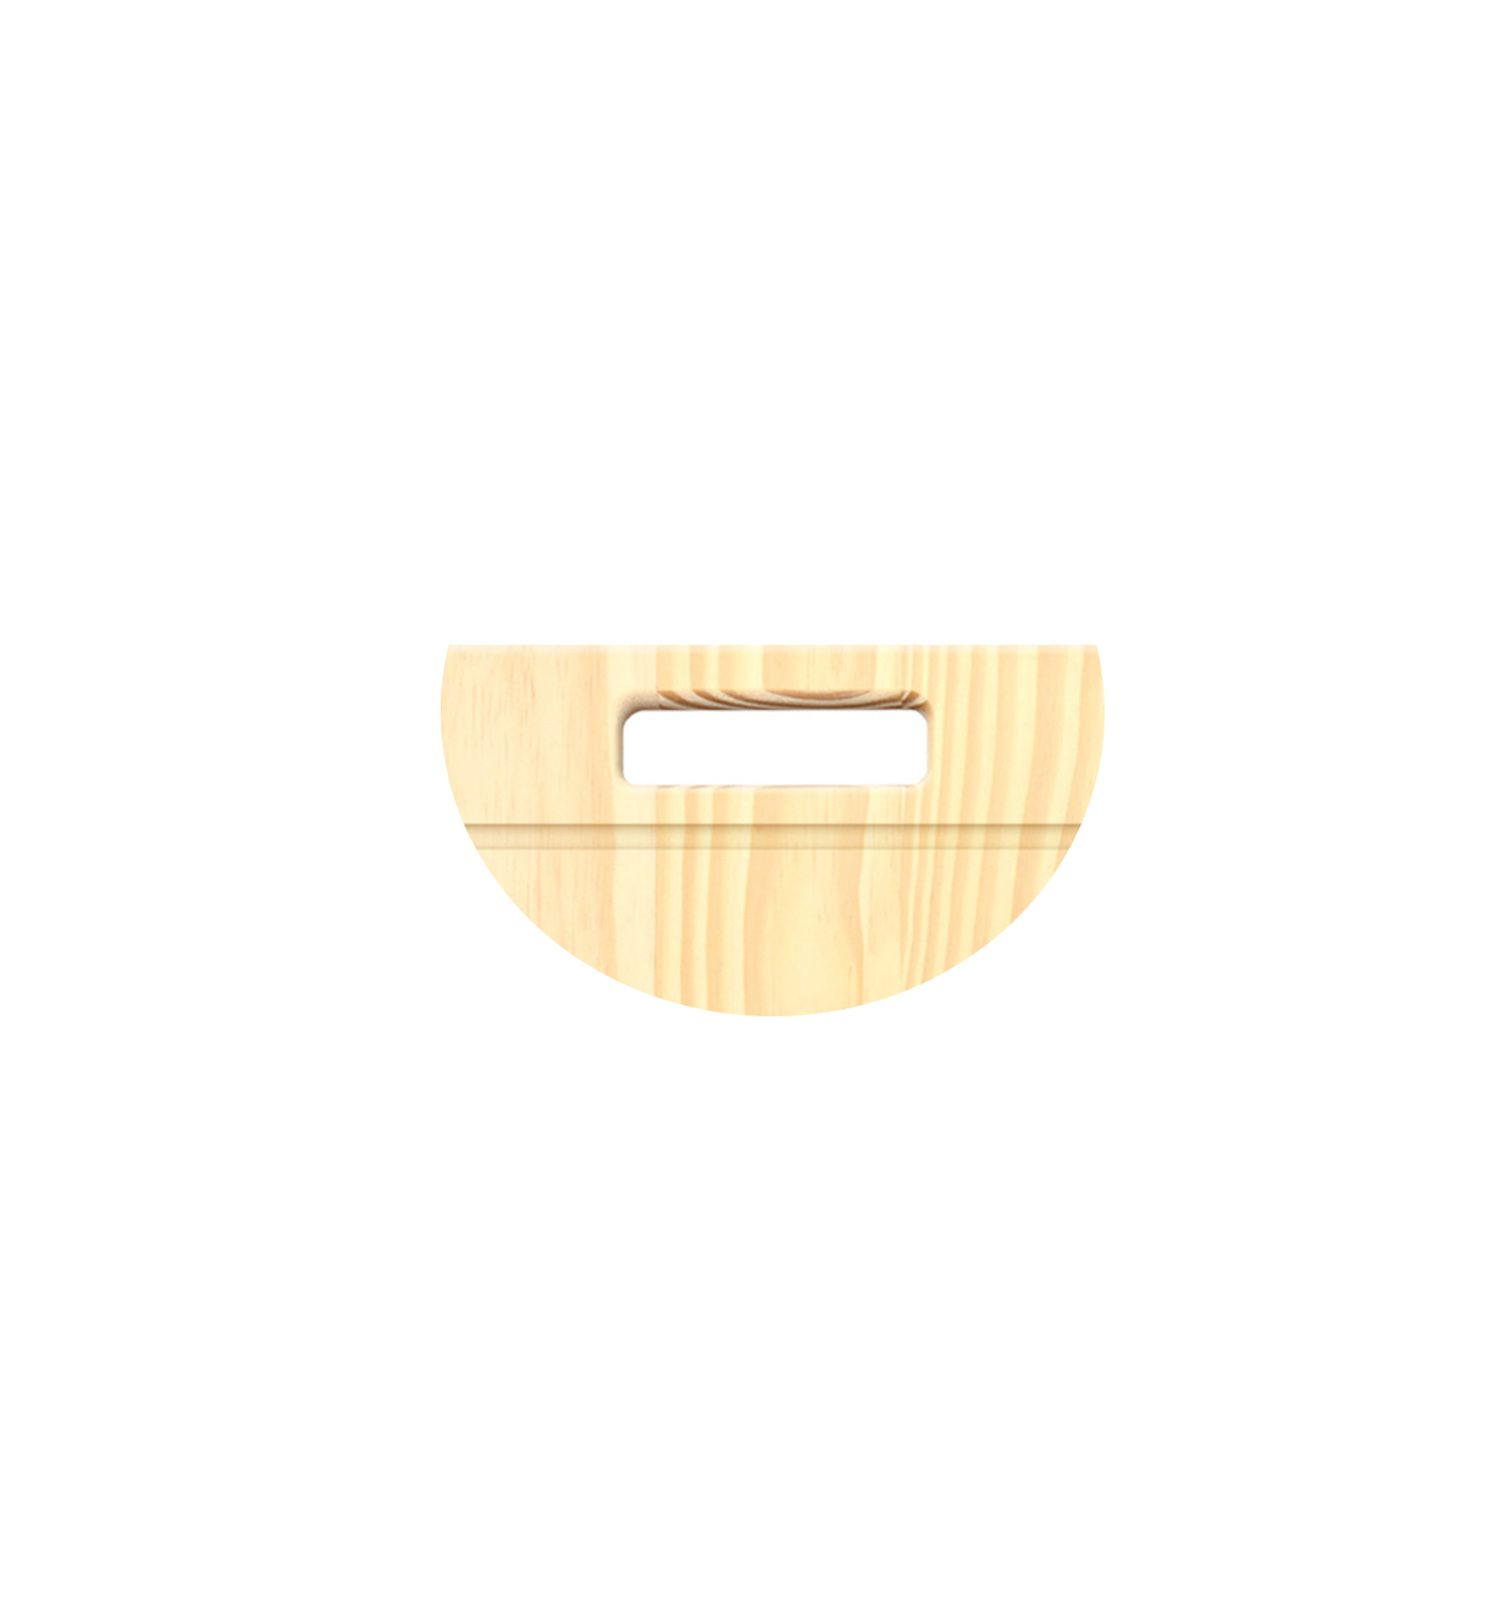 Tabua de Carne Pinus com Canaleta 39x25